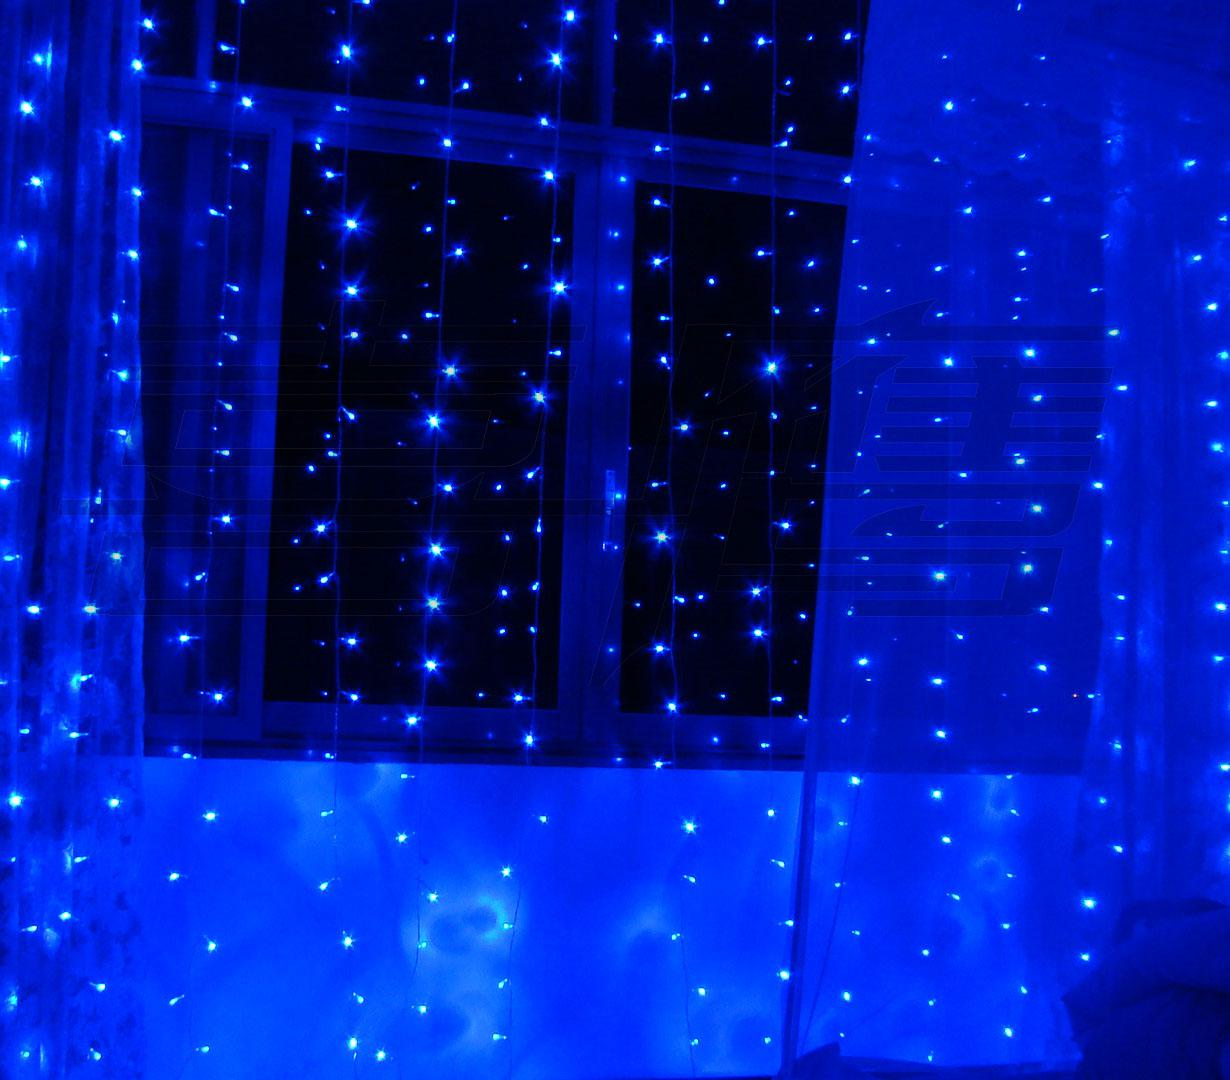 800 bombillas LED 8 m * 3 m luces de la cortina, luces impermeables del ornamento de la Navidad, boda ligera coloreada de la boda, tira de luces LED de hadas tiras de iluminación